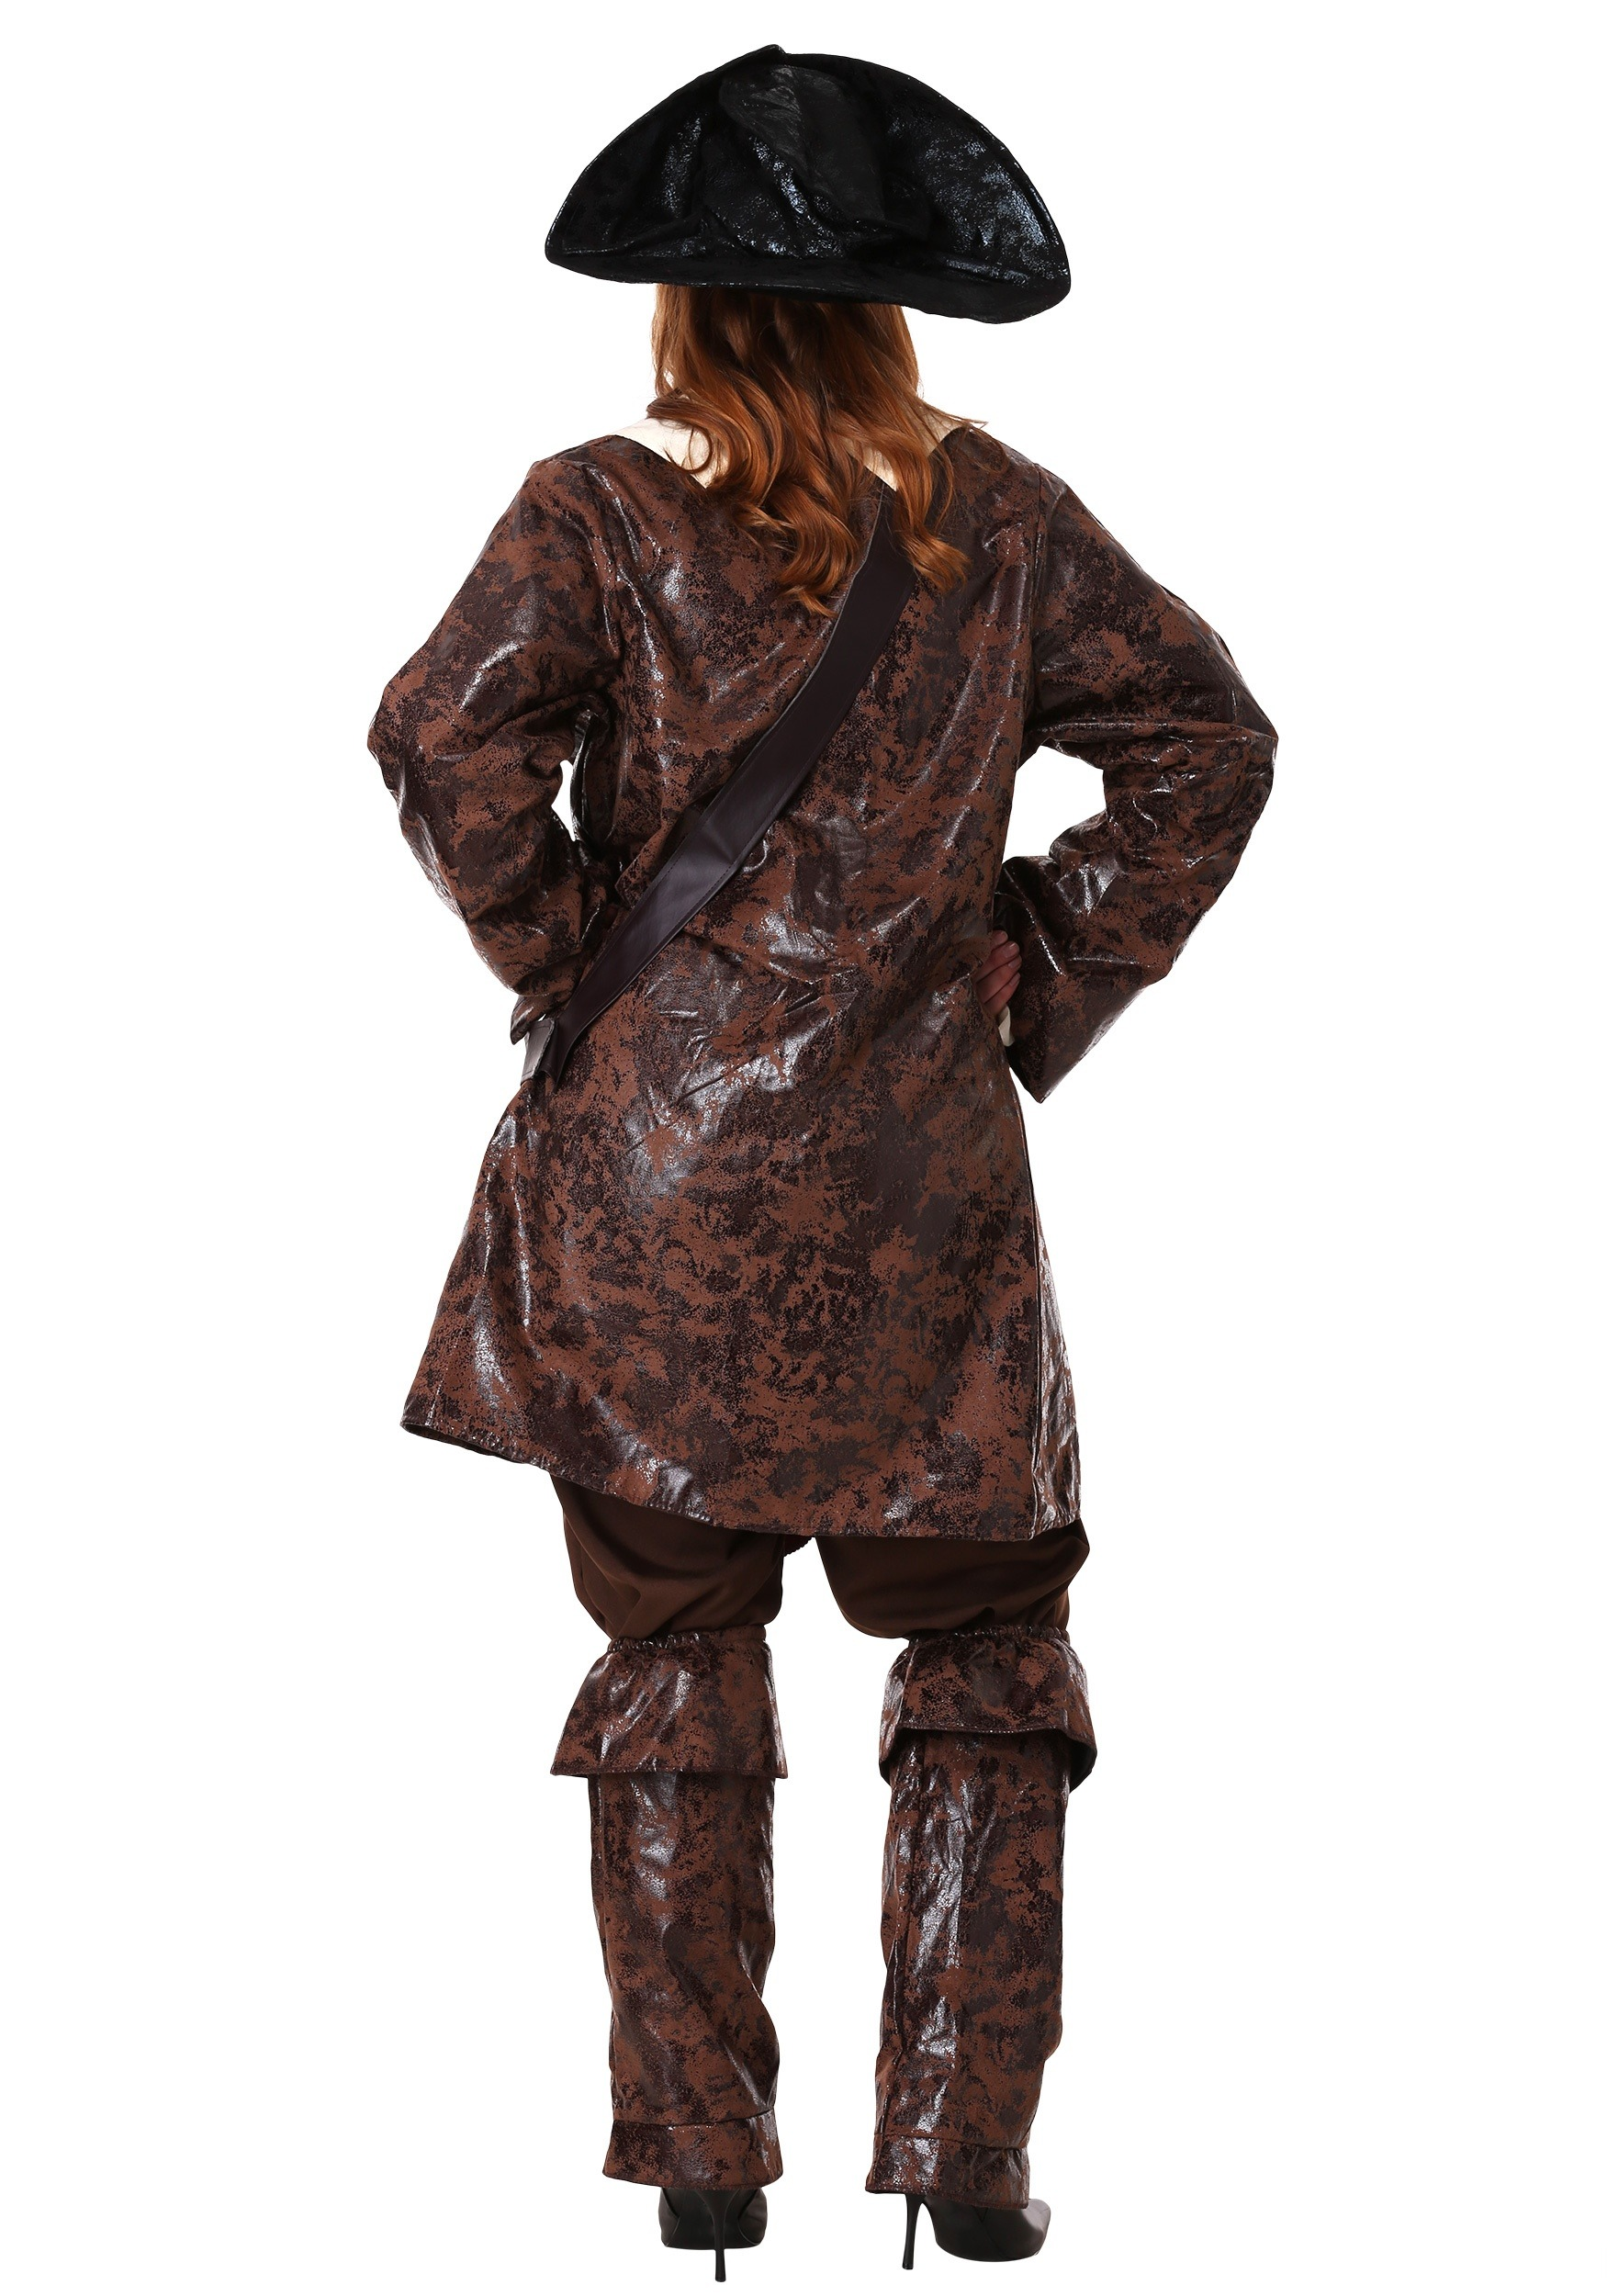 Plus Size Women S Caribbean Pirate Costume 1x 2x 3x 4x 5x 6x 7x